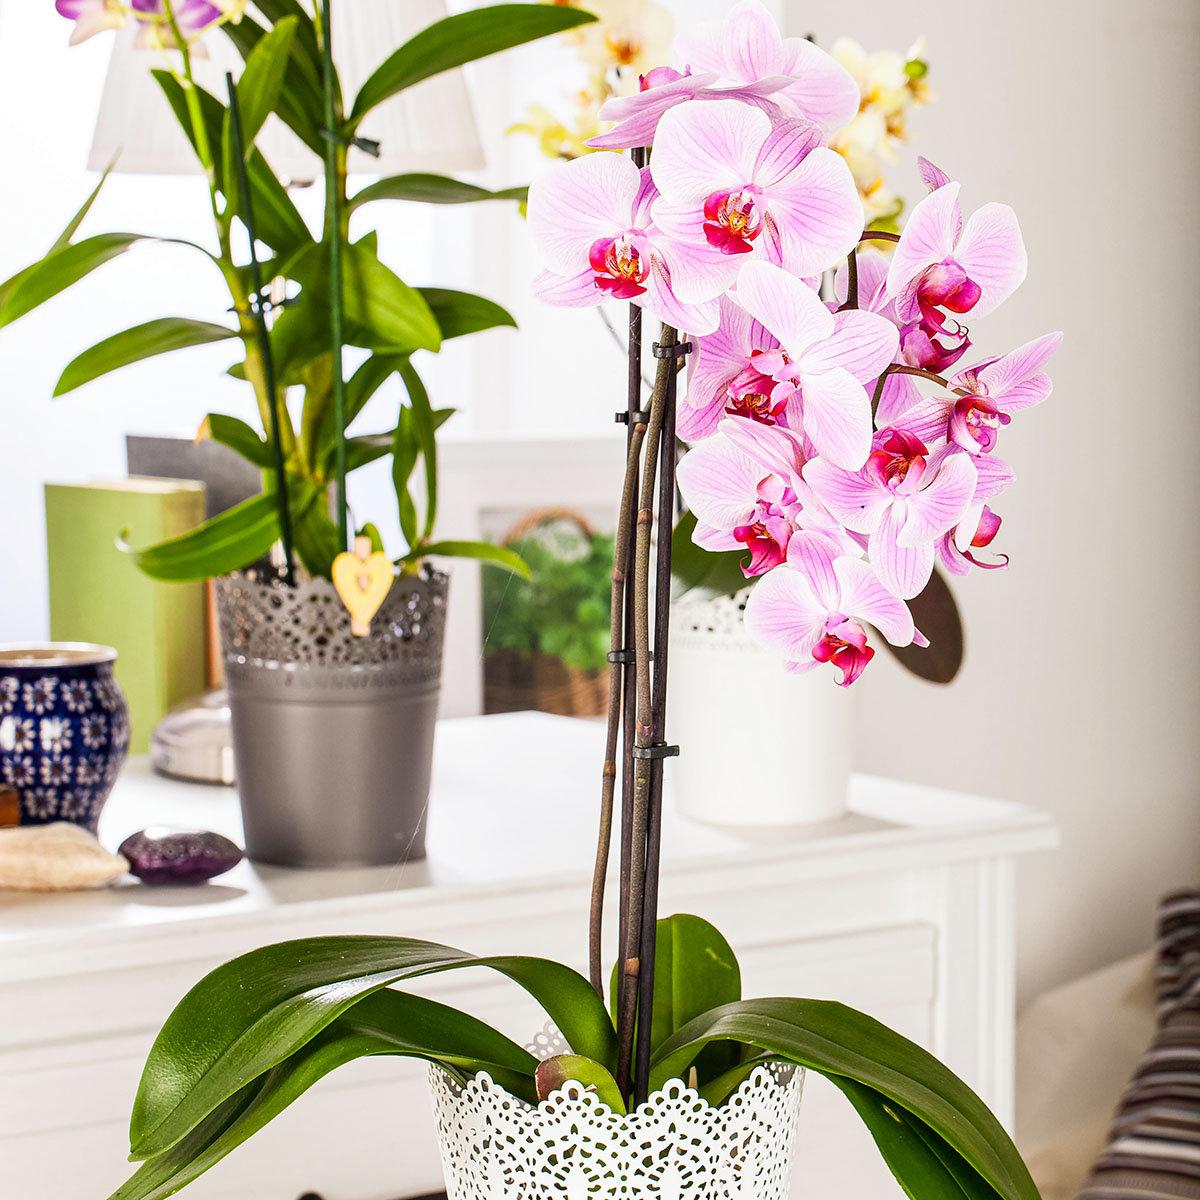 Rosa Schmetterlings-Orchidee, im ca. 12 cm-Topf